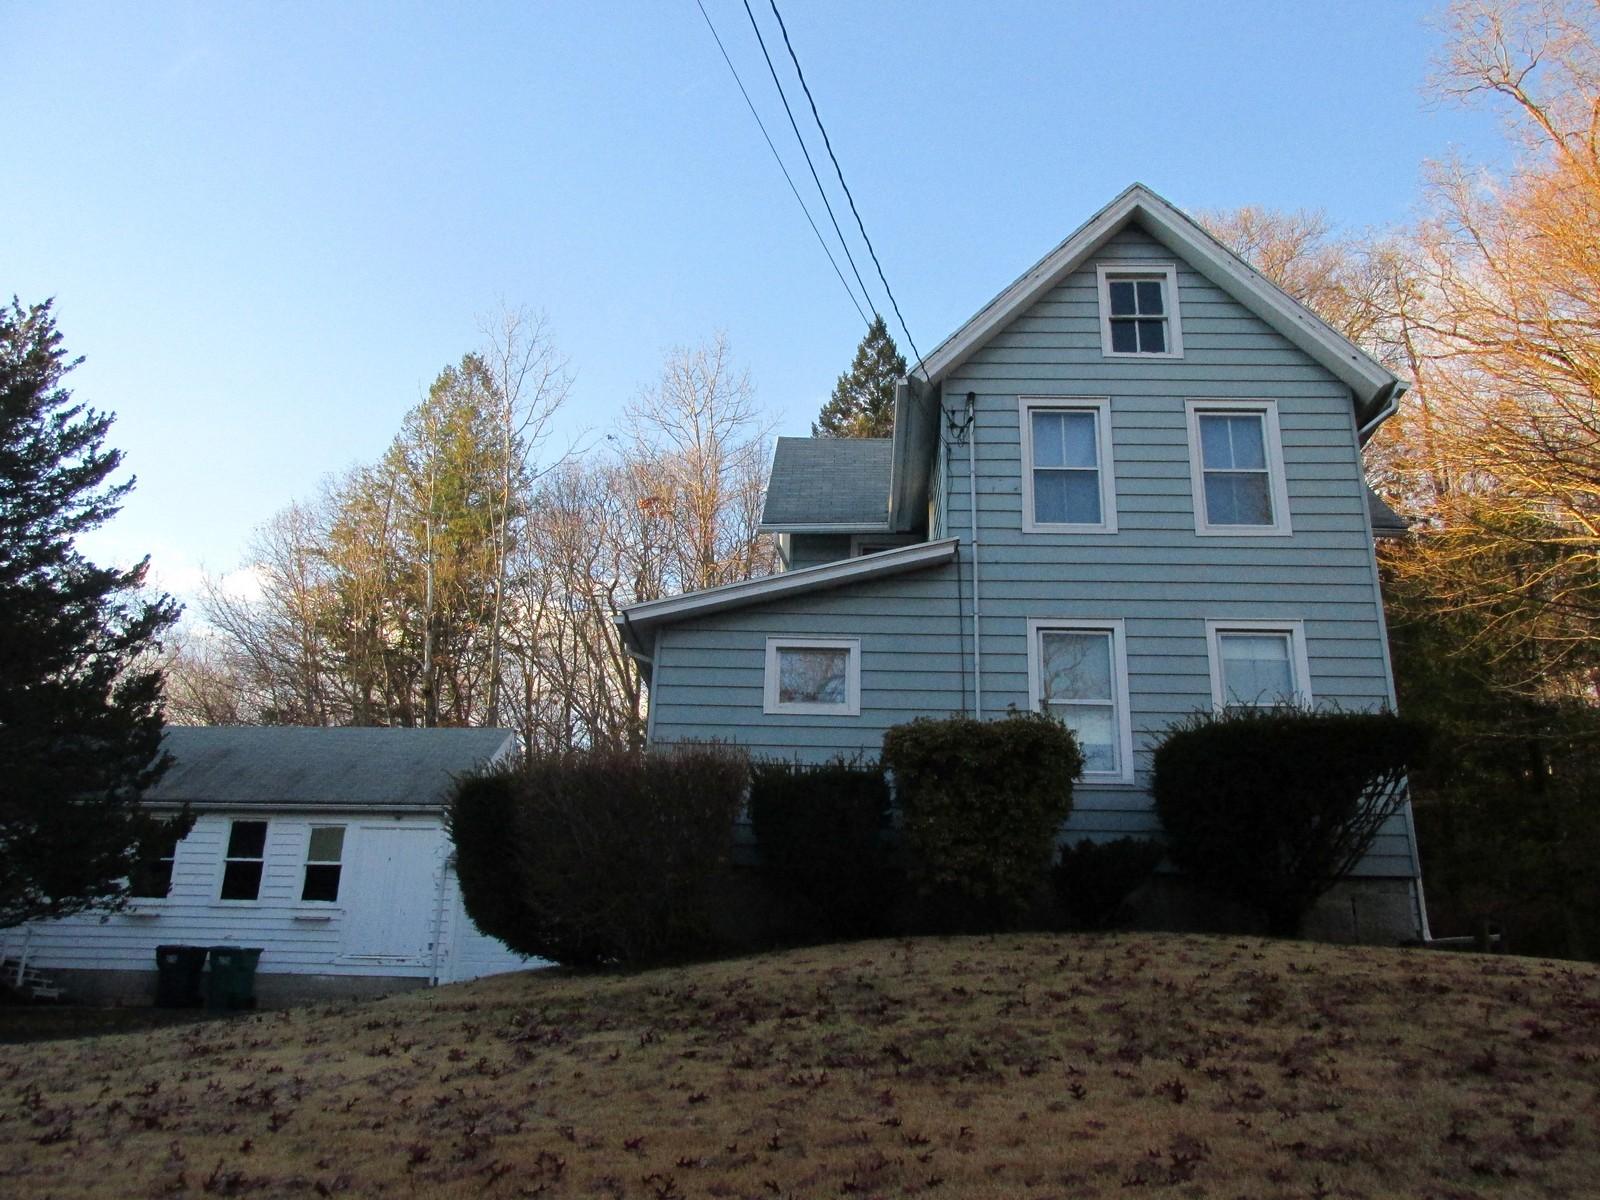 獨棟家庭住宅 為 出售 在 A Property Perfect for a Builder or Carpenter 27 Chestnut Street Seymour, 康涅狄格州, 06483 美國